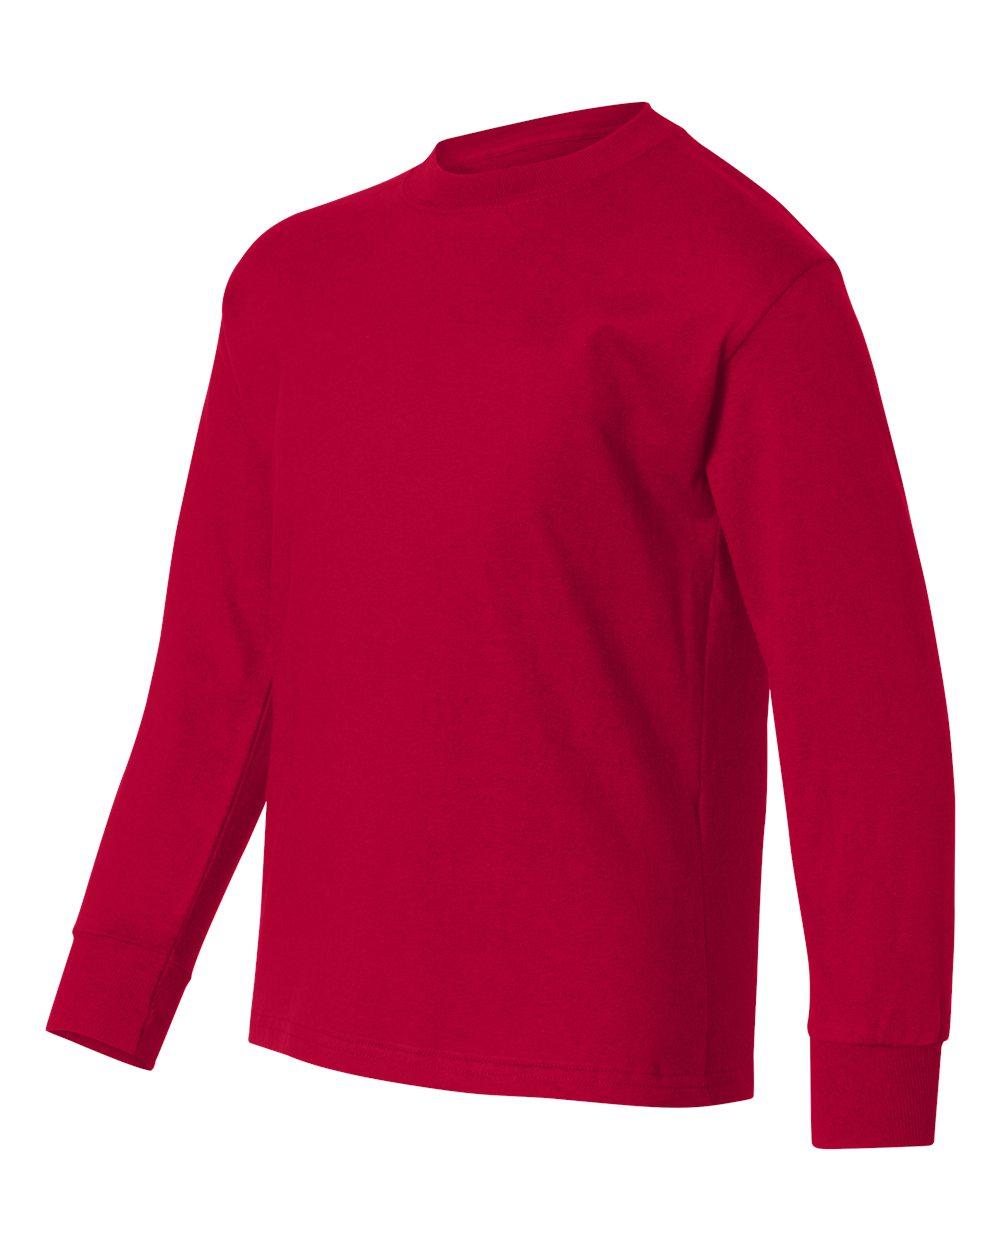 Hanes 5546 - TAGLESS Youth Long Sleeve T-Shirt